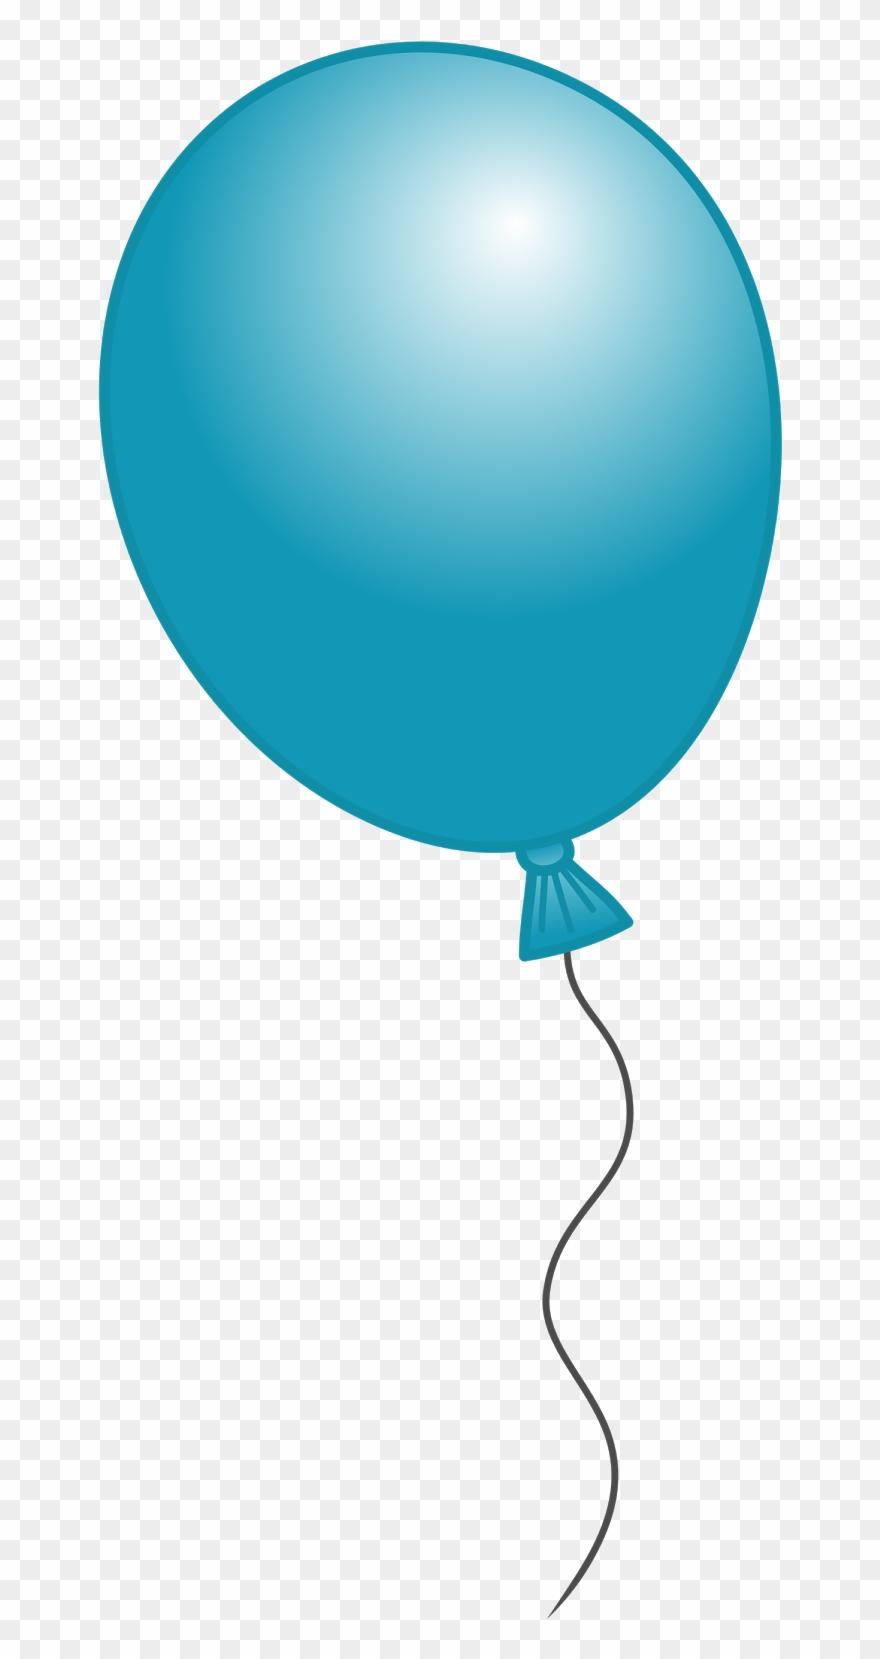 Balloon clipart clip art. Black balloons cliparts free